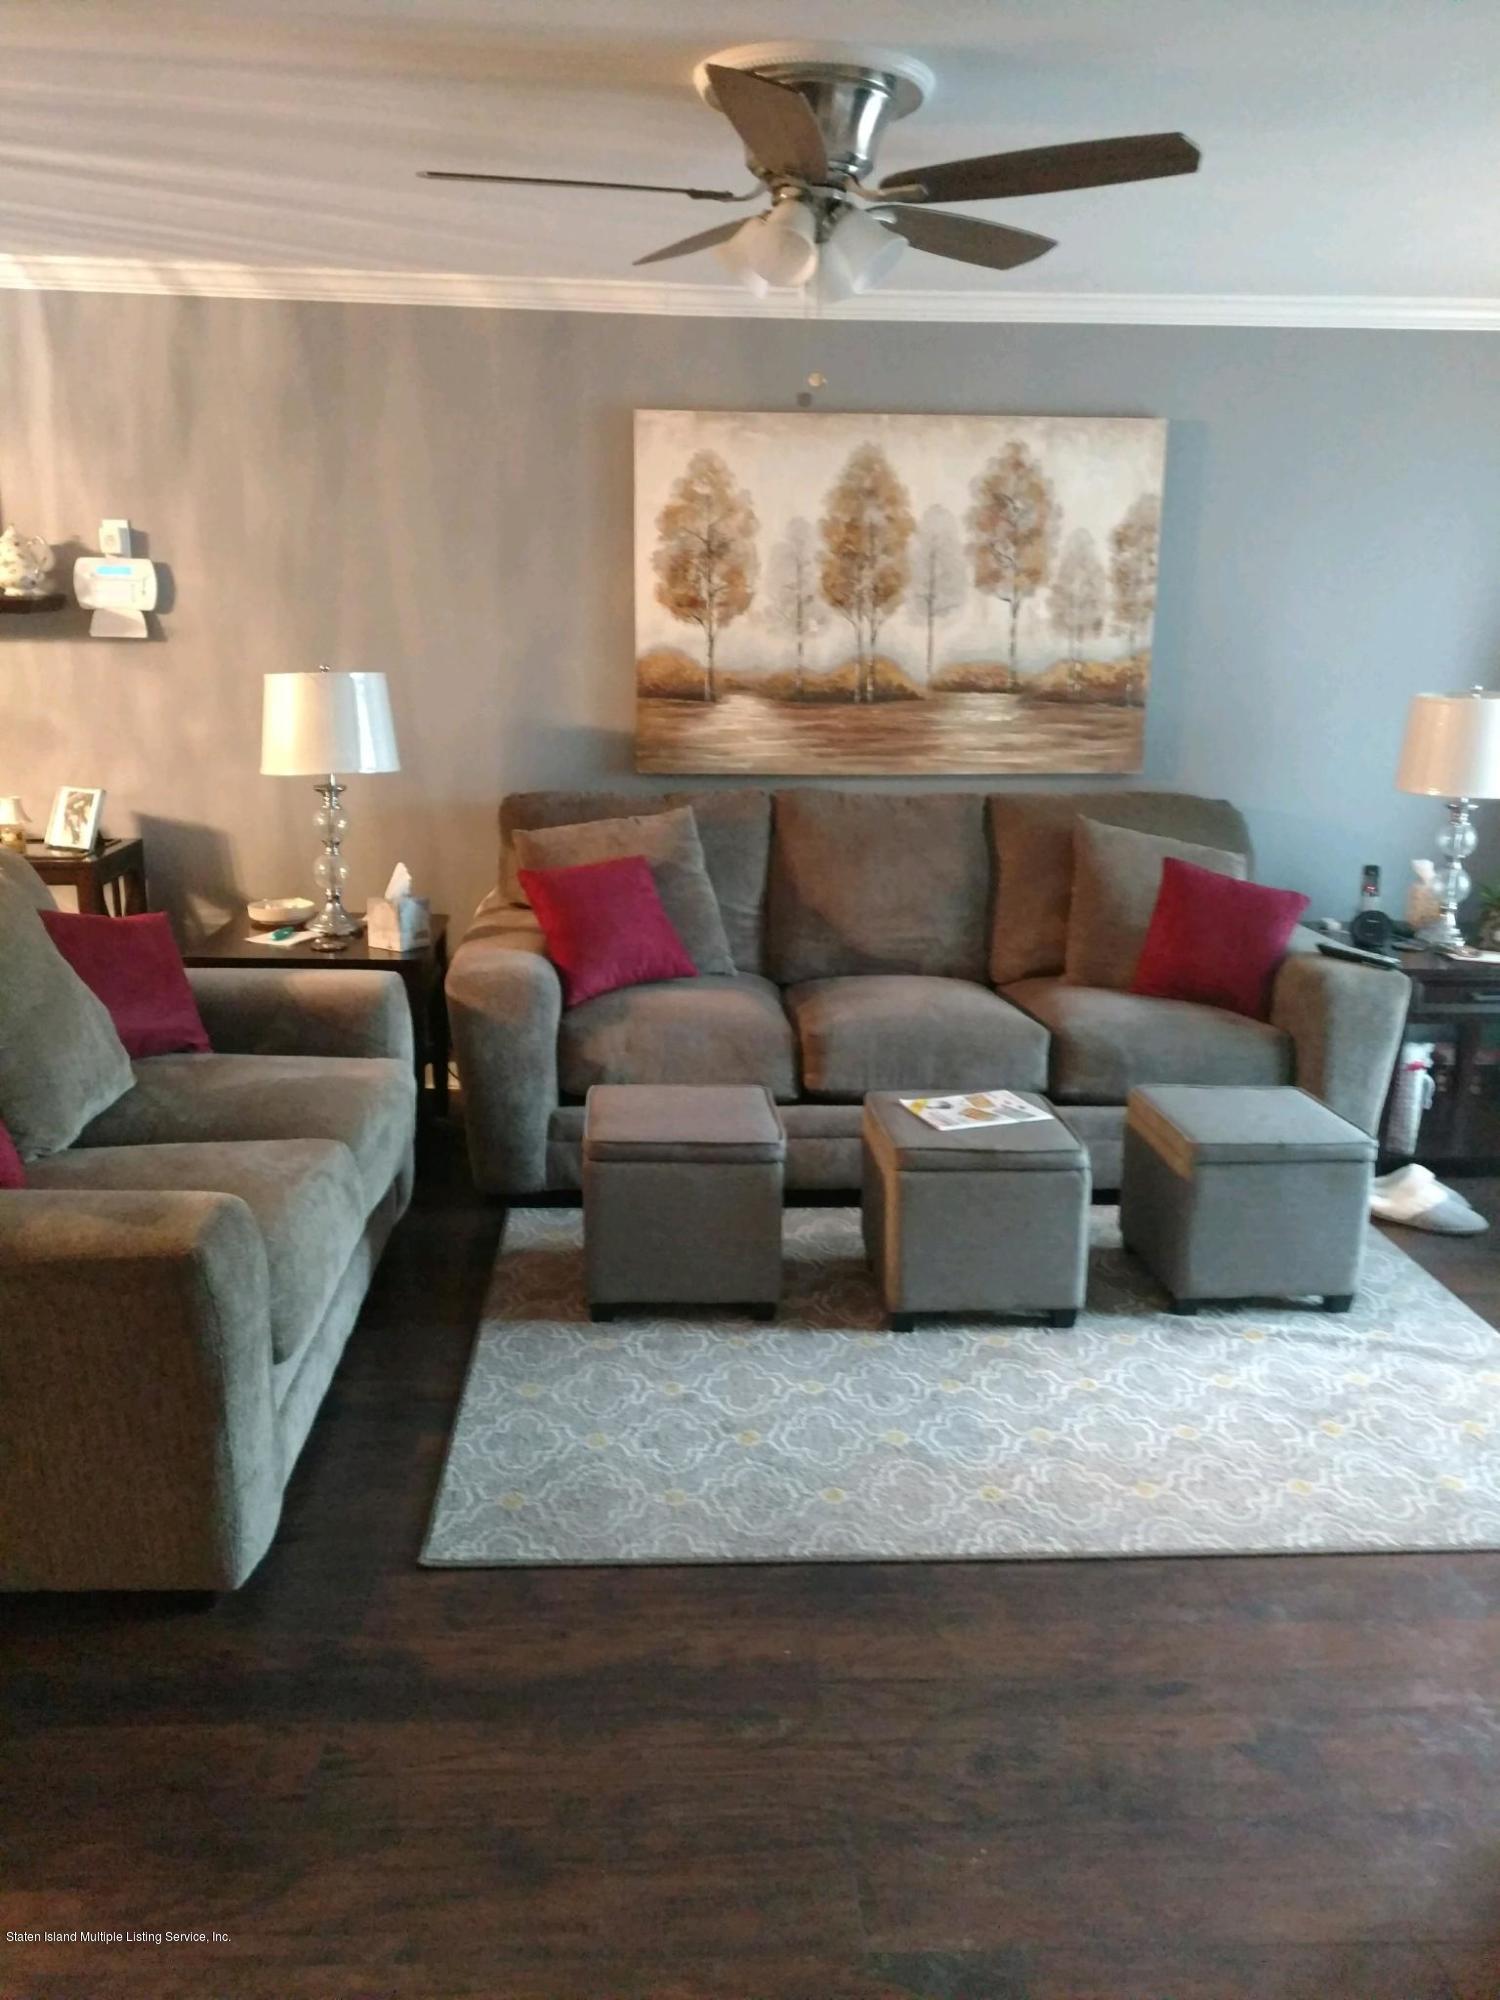 Single Family - Semi-Attached 102 Stack Drive  Staten Island, NY 10312, MLS-1115880-7